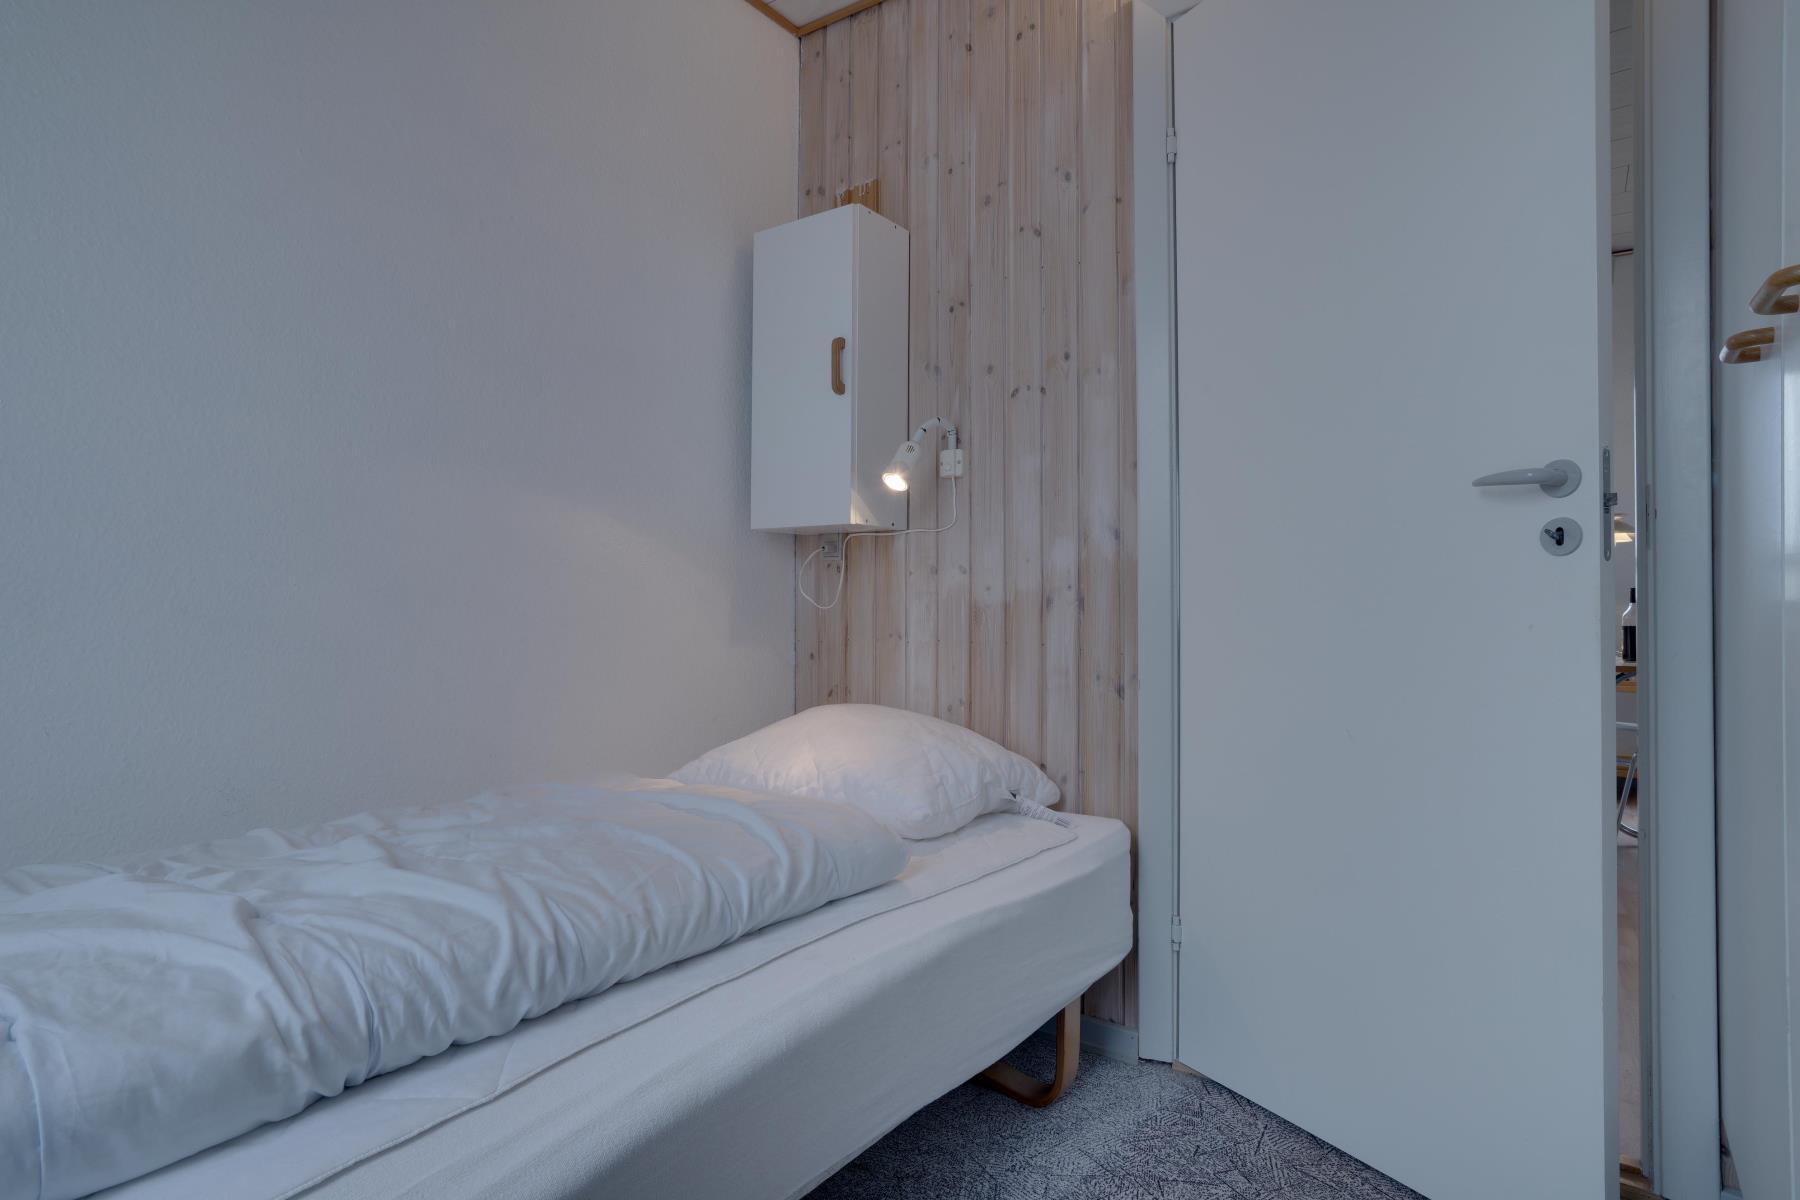 Ferienhaus 1019 - Hjelmevej 15, App. 19